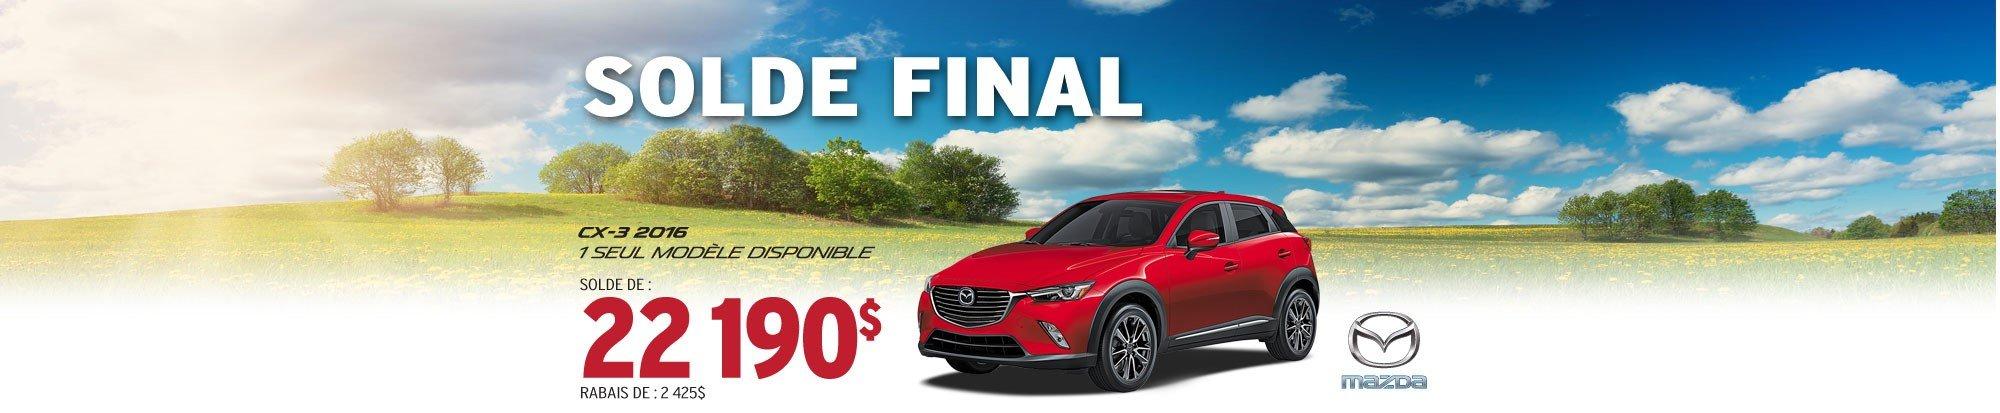 SOLDE FINAL - Mazda CX-3 2016 web